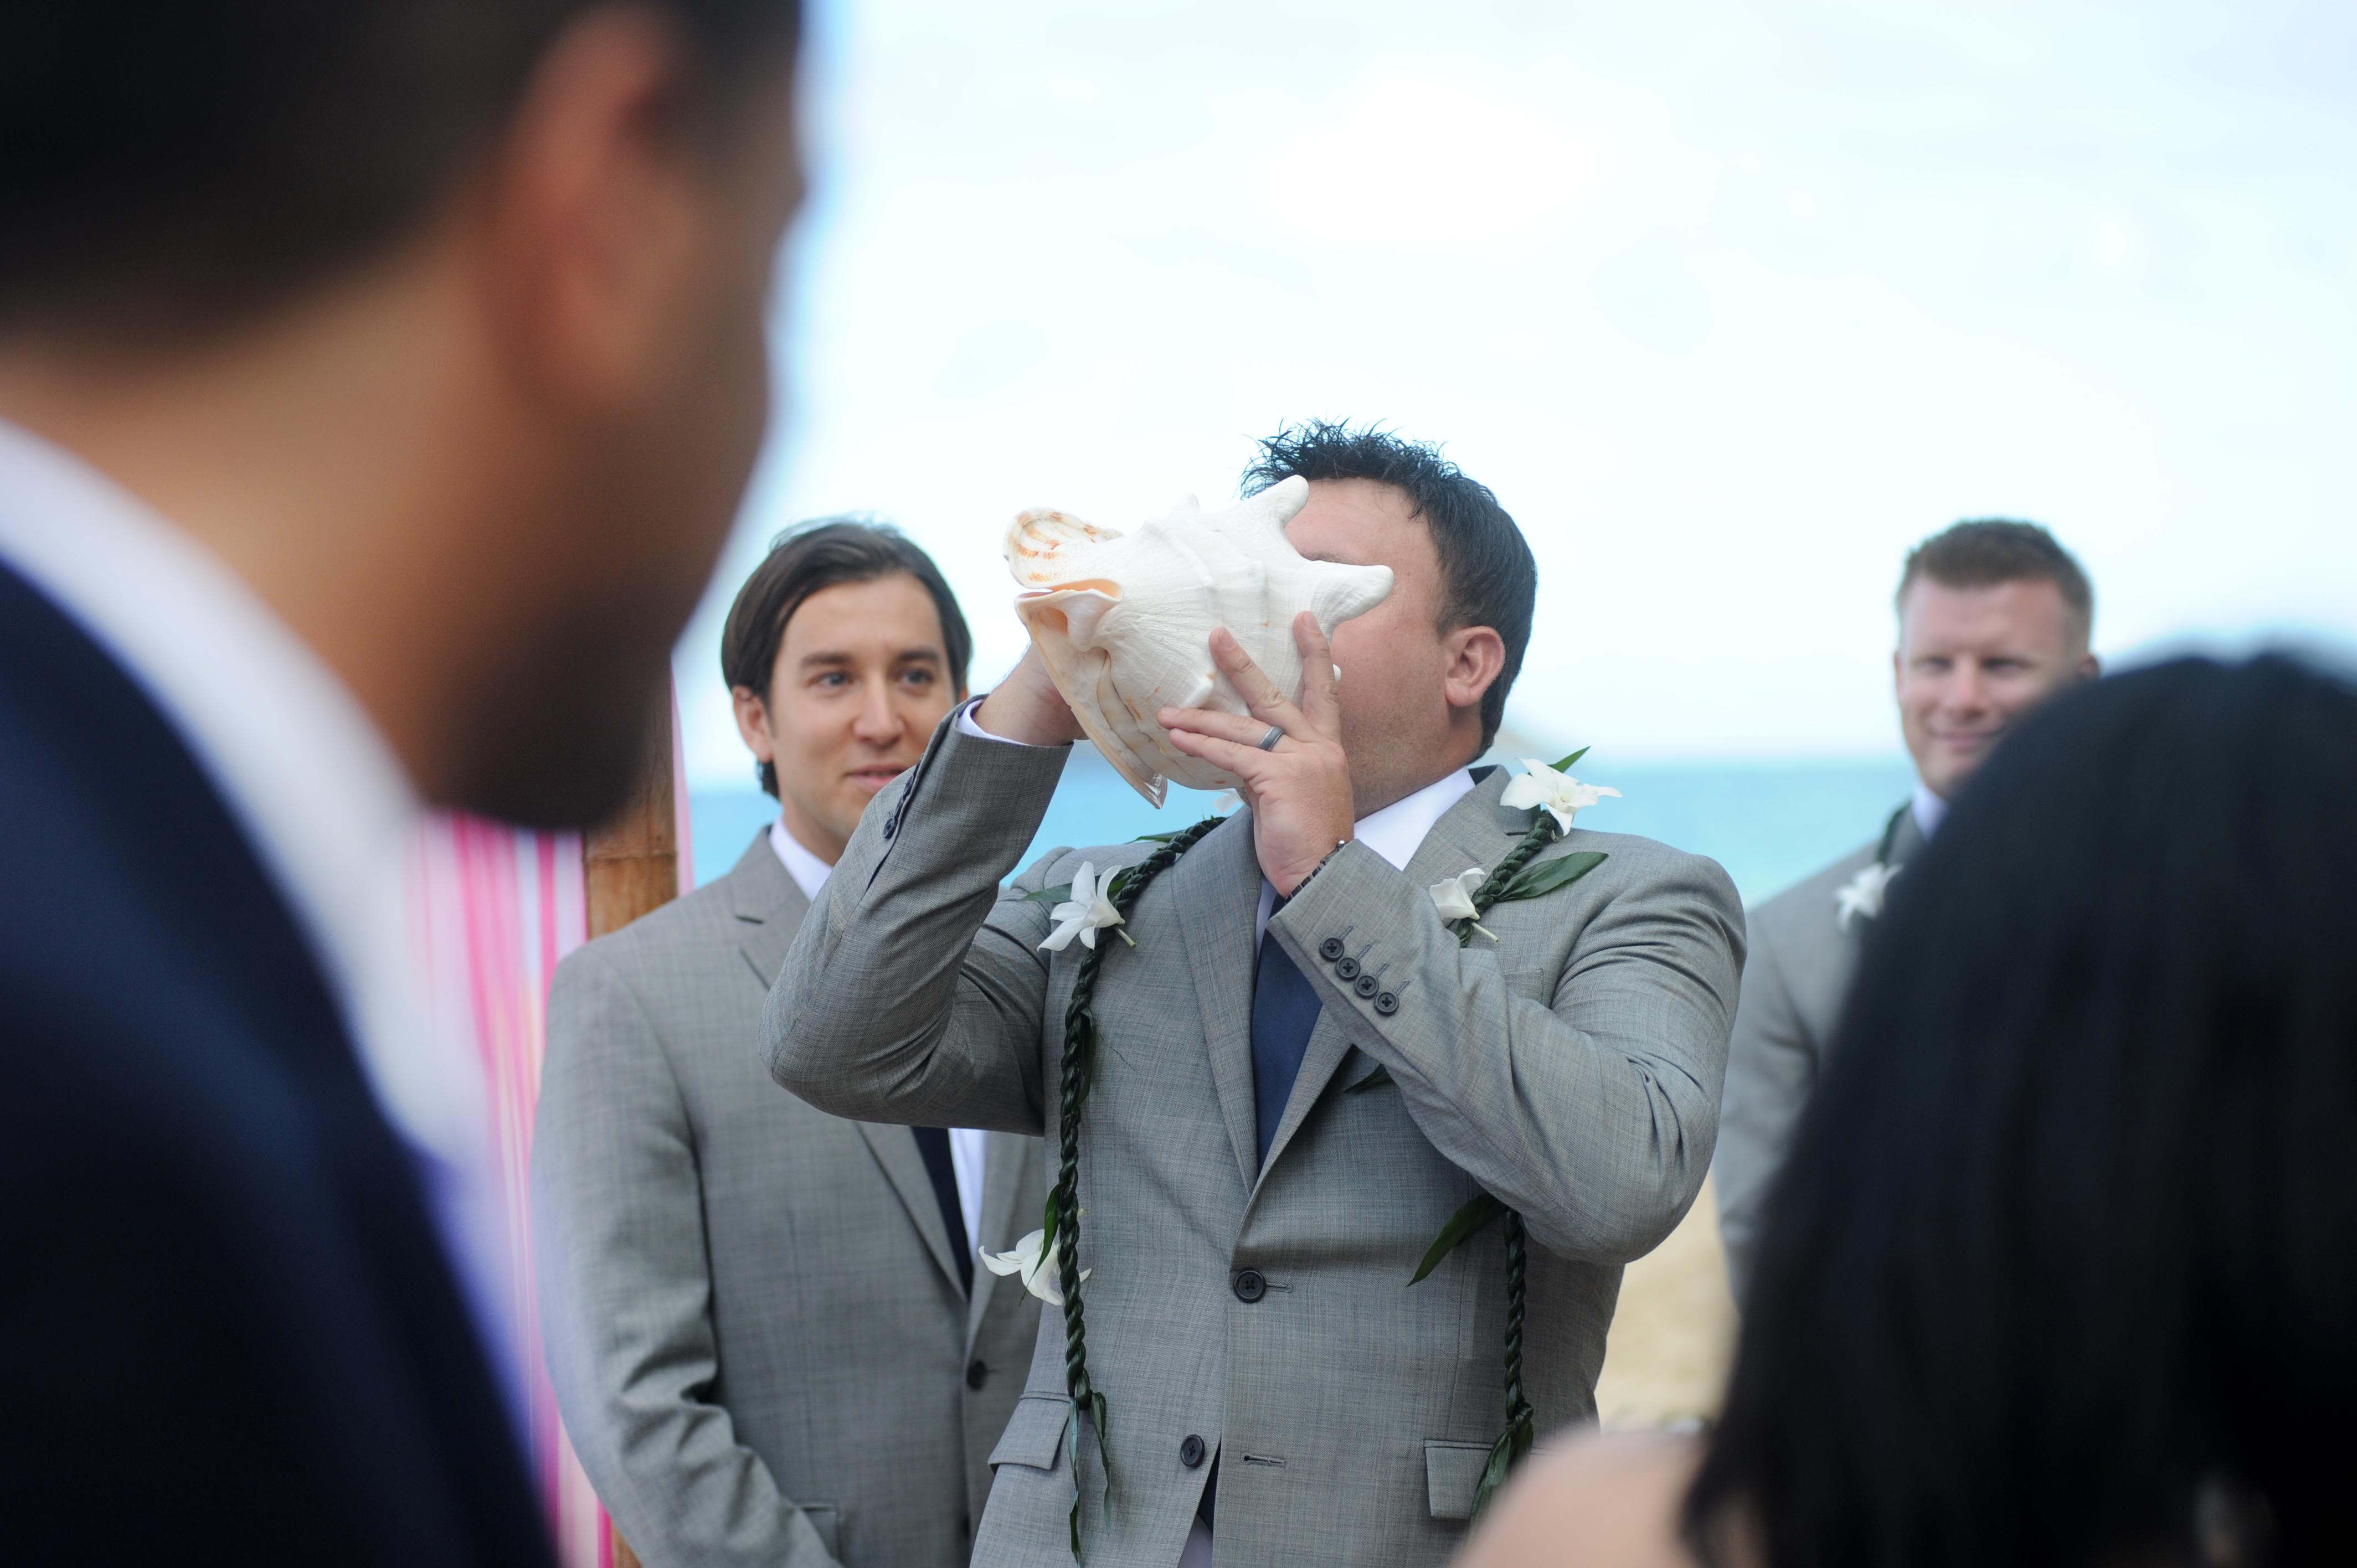 wedding In Hawaii - wedding ceremony-23